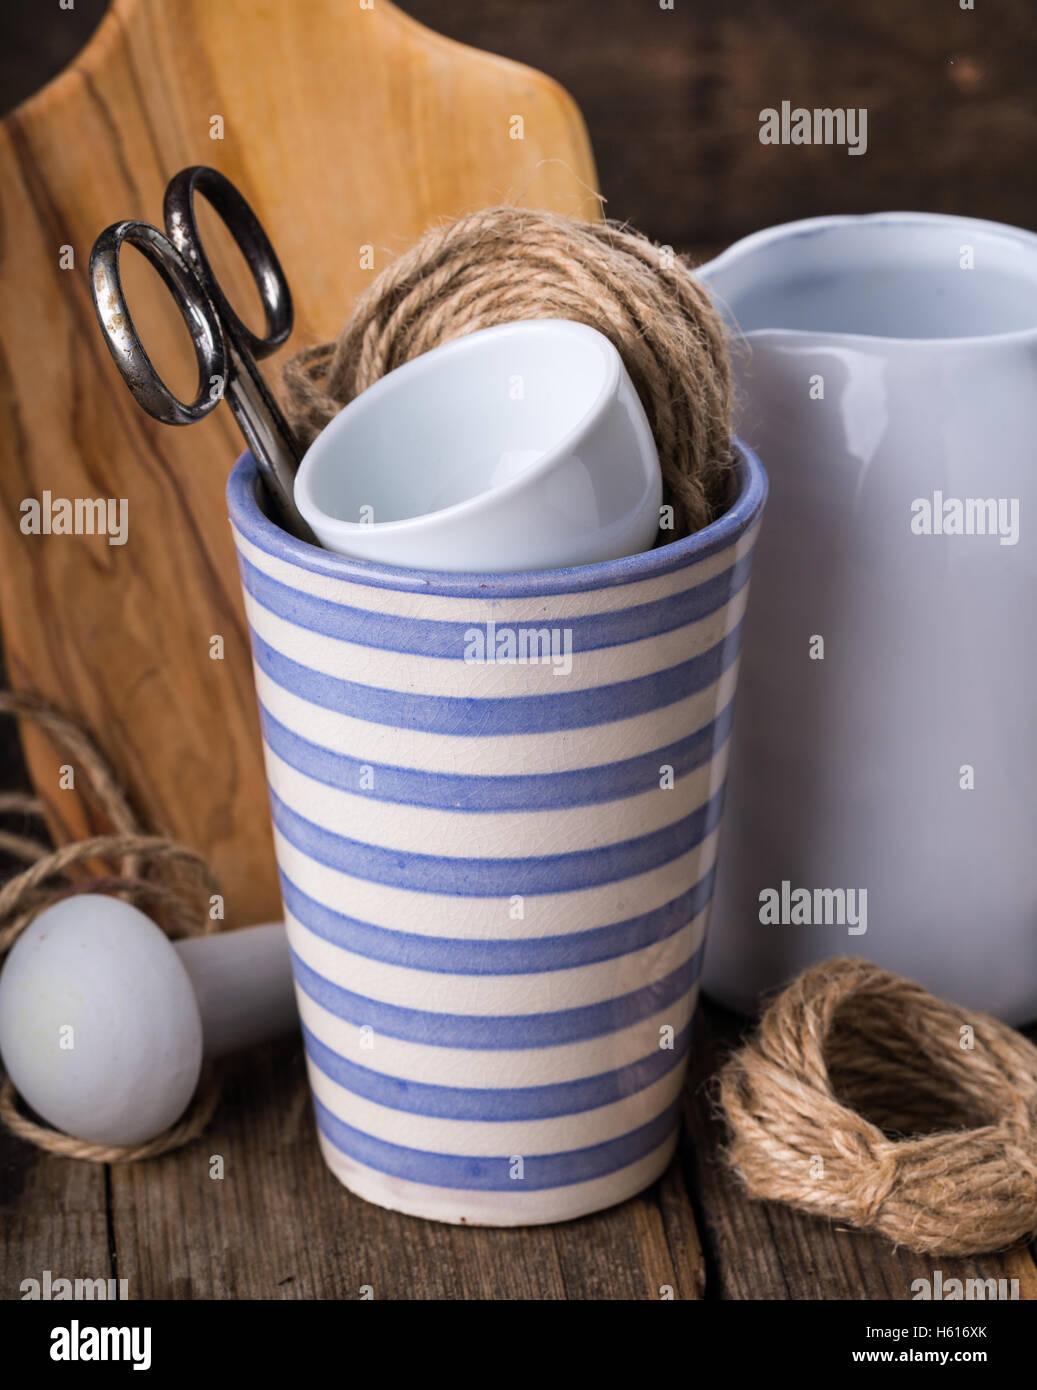 Beautiful stripped mug on wooden background - Stock Image